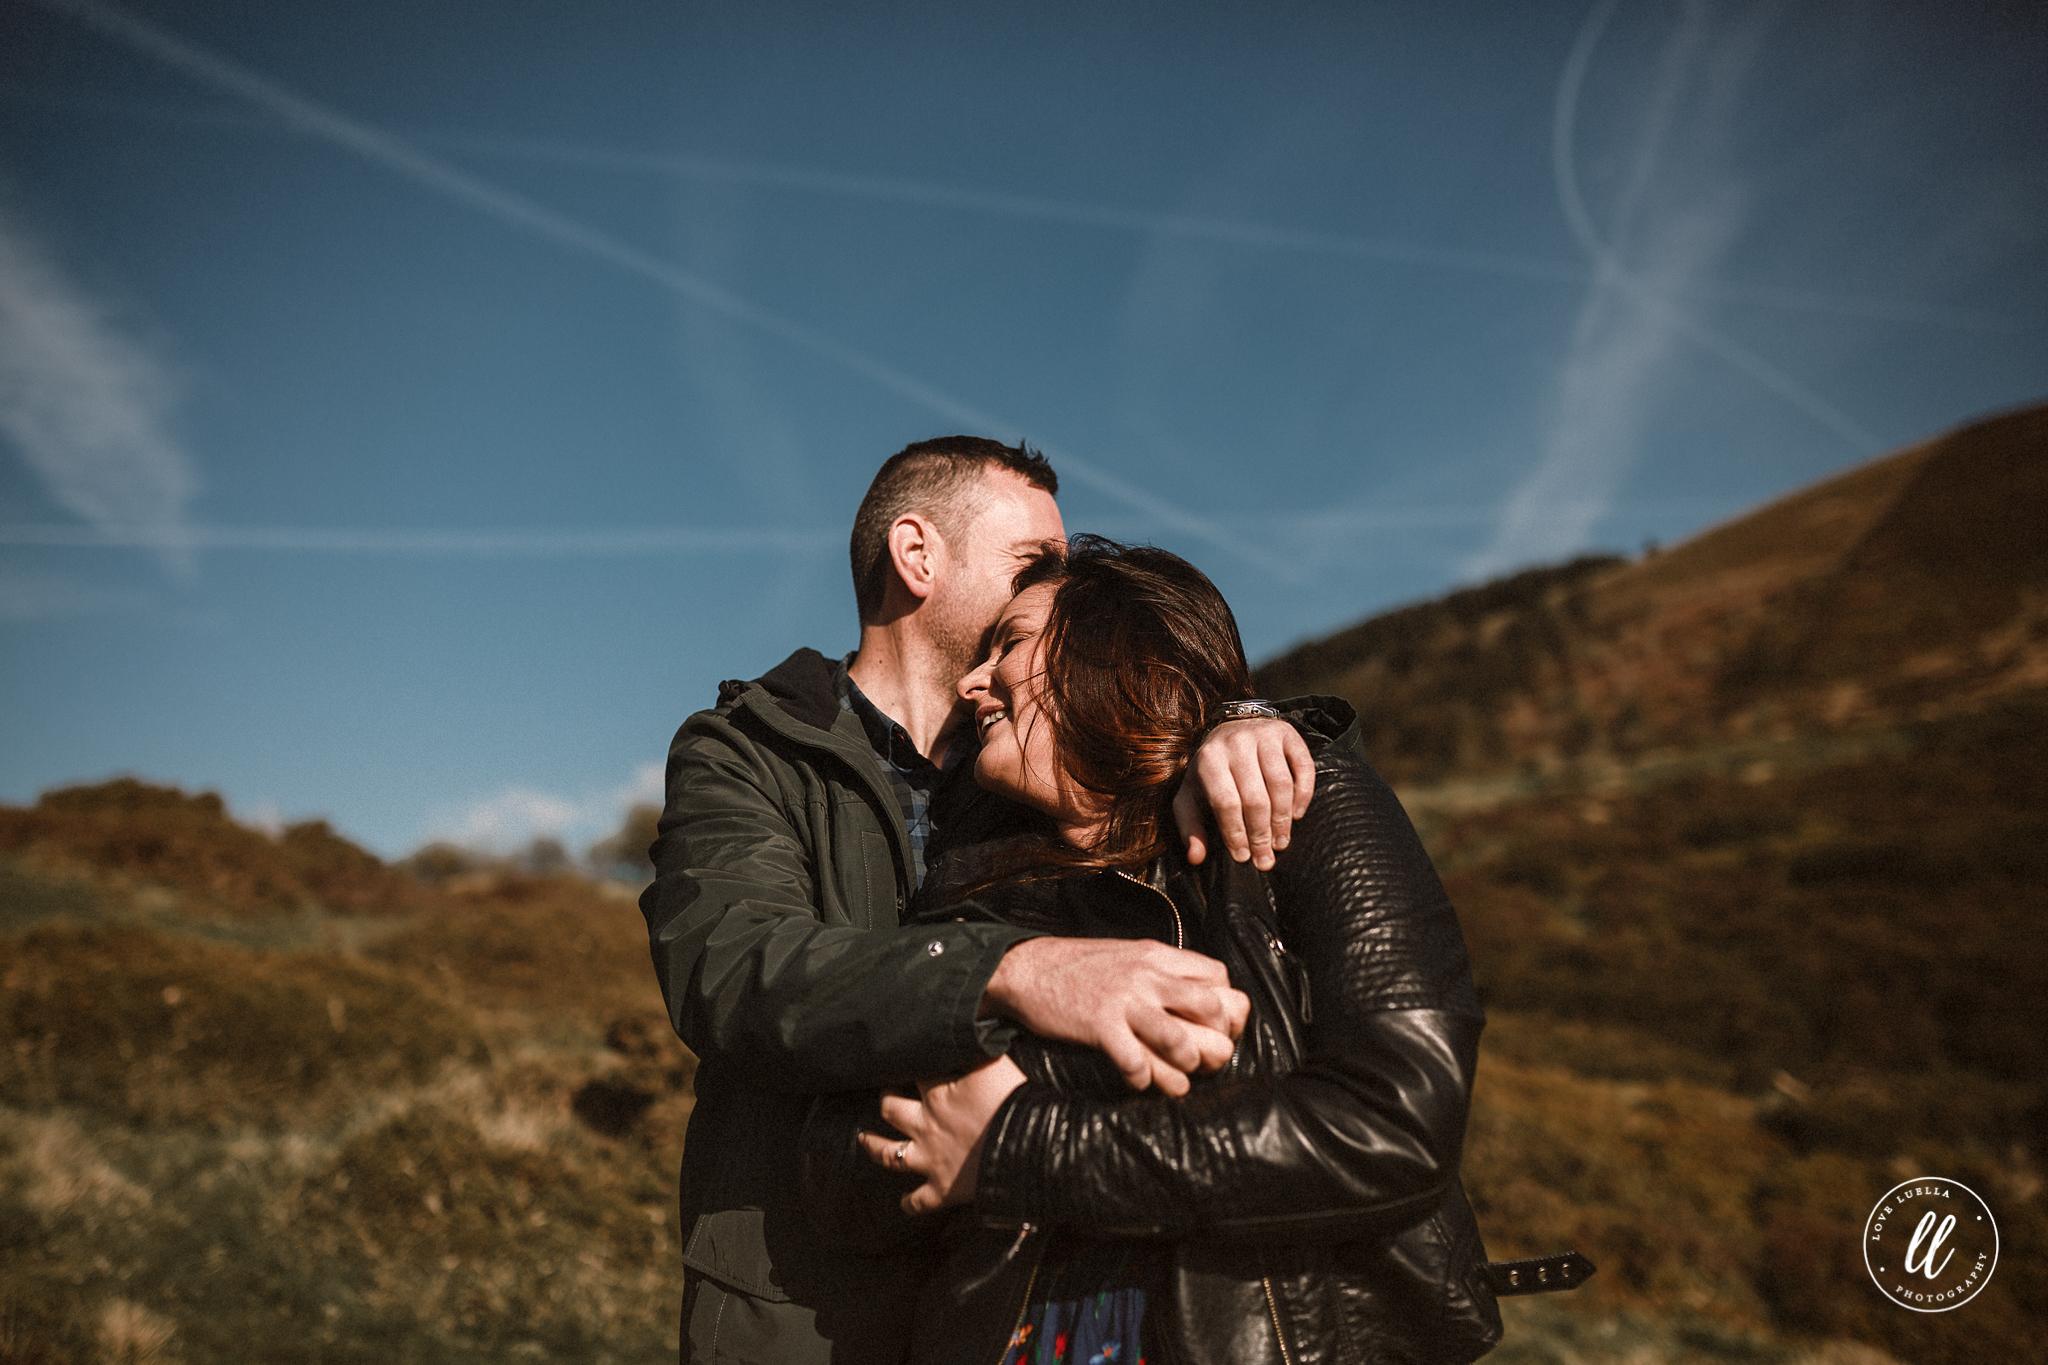 intimate wedding photography, cheshire wedding photography, north west couple photography, sky trail photography, ruthin wedding photography, snowdonia wedding photographer, alternative couple photography cheshire